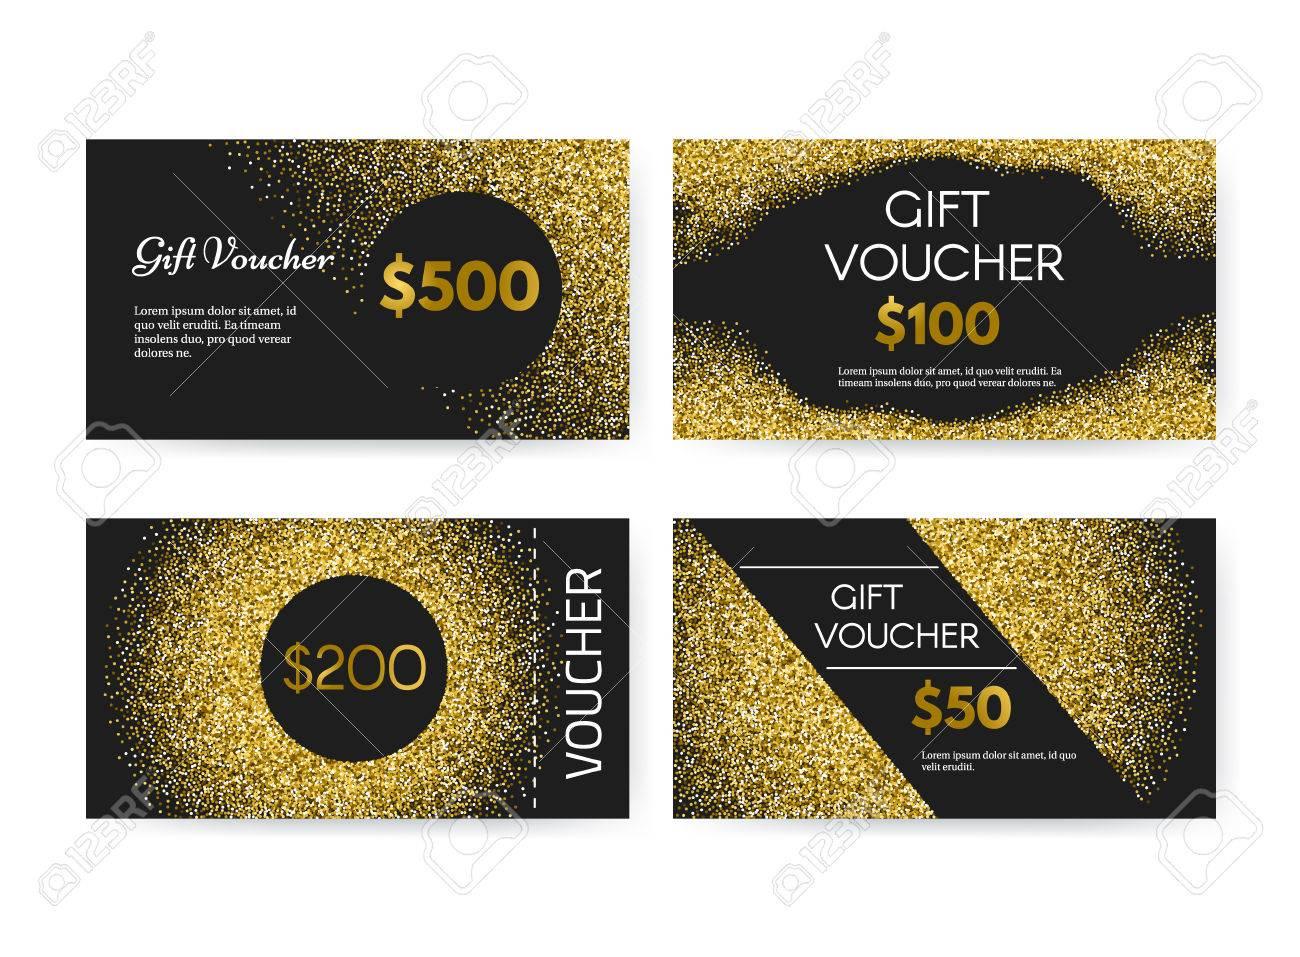 Gift Voucher Or Gift Certificate Vector Template With Golden - 100 gift certificate template